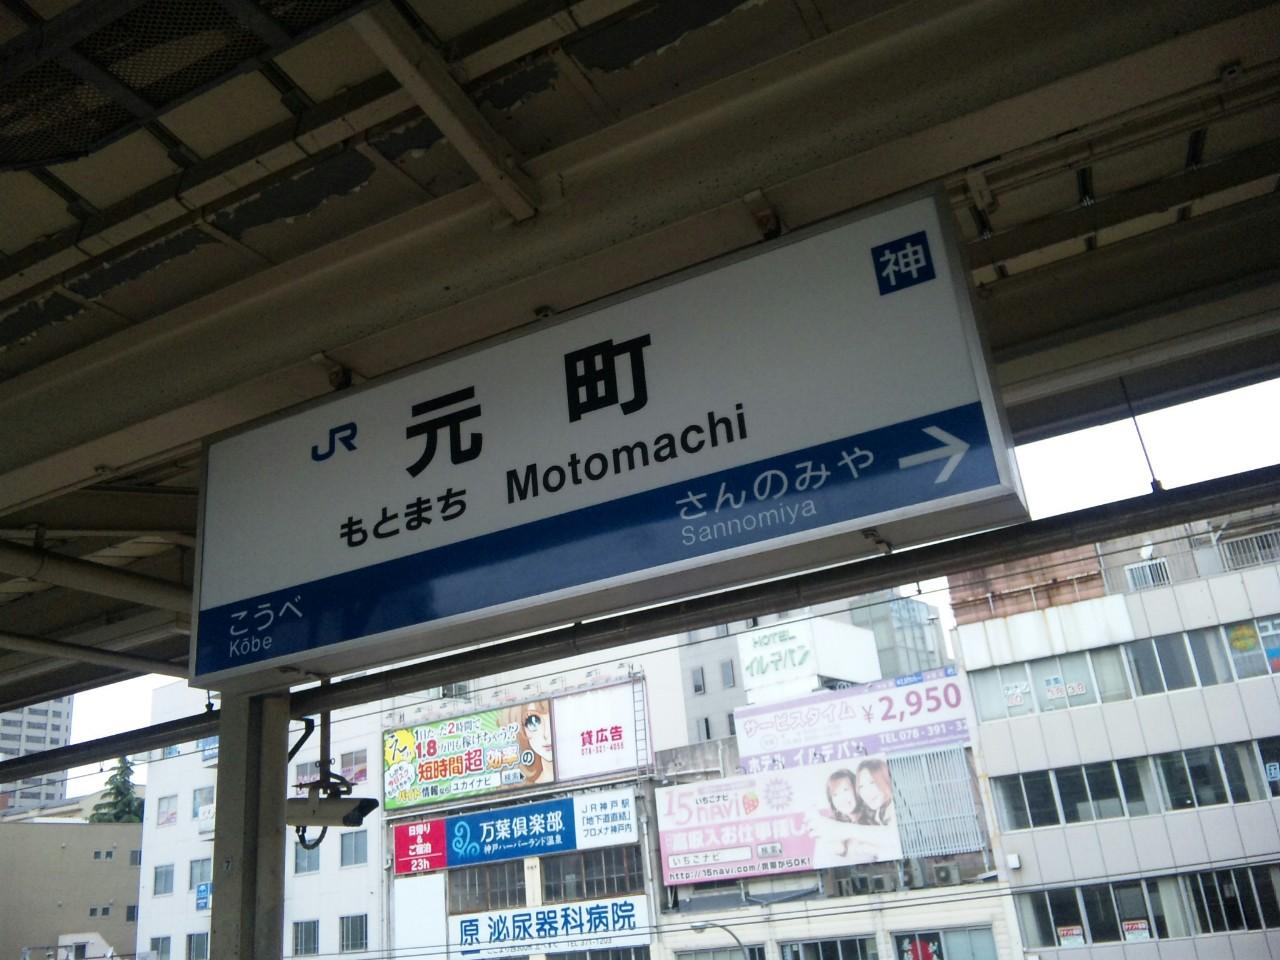 大阪北部で